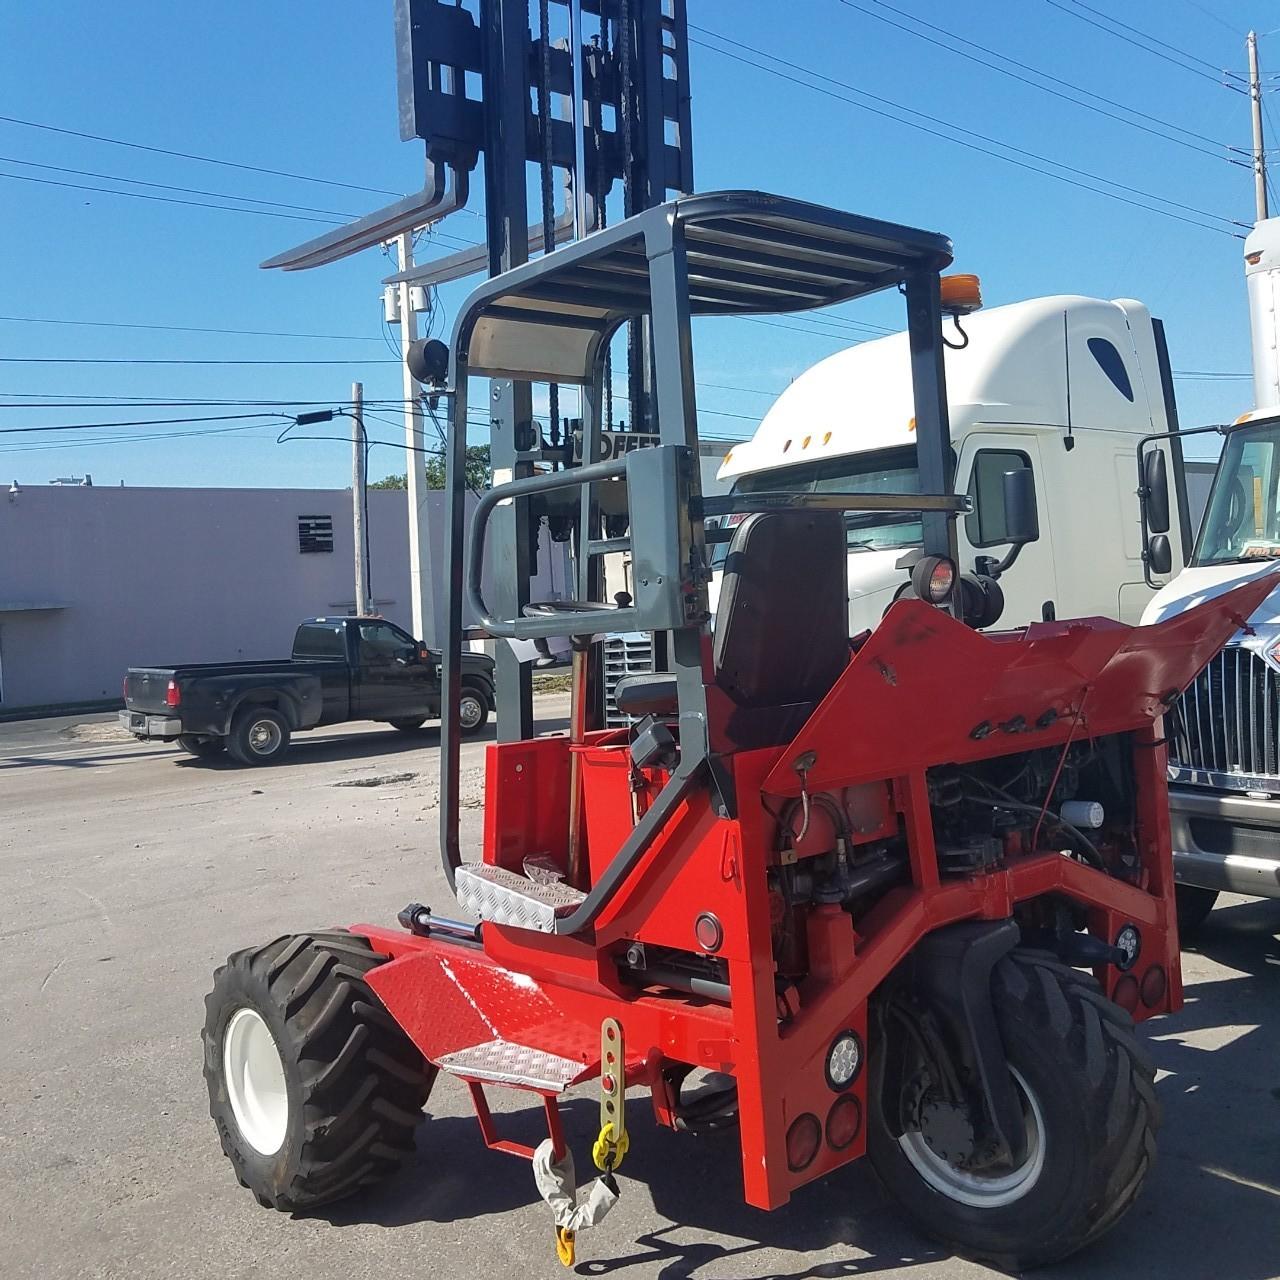 moffett m5000 forklifts for sale equipmenttrader com rh equipmenttrader com moffett forklift m5000 parts manual moffett mounty m5000 parts